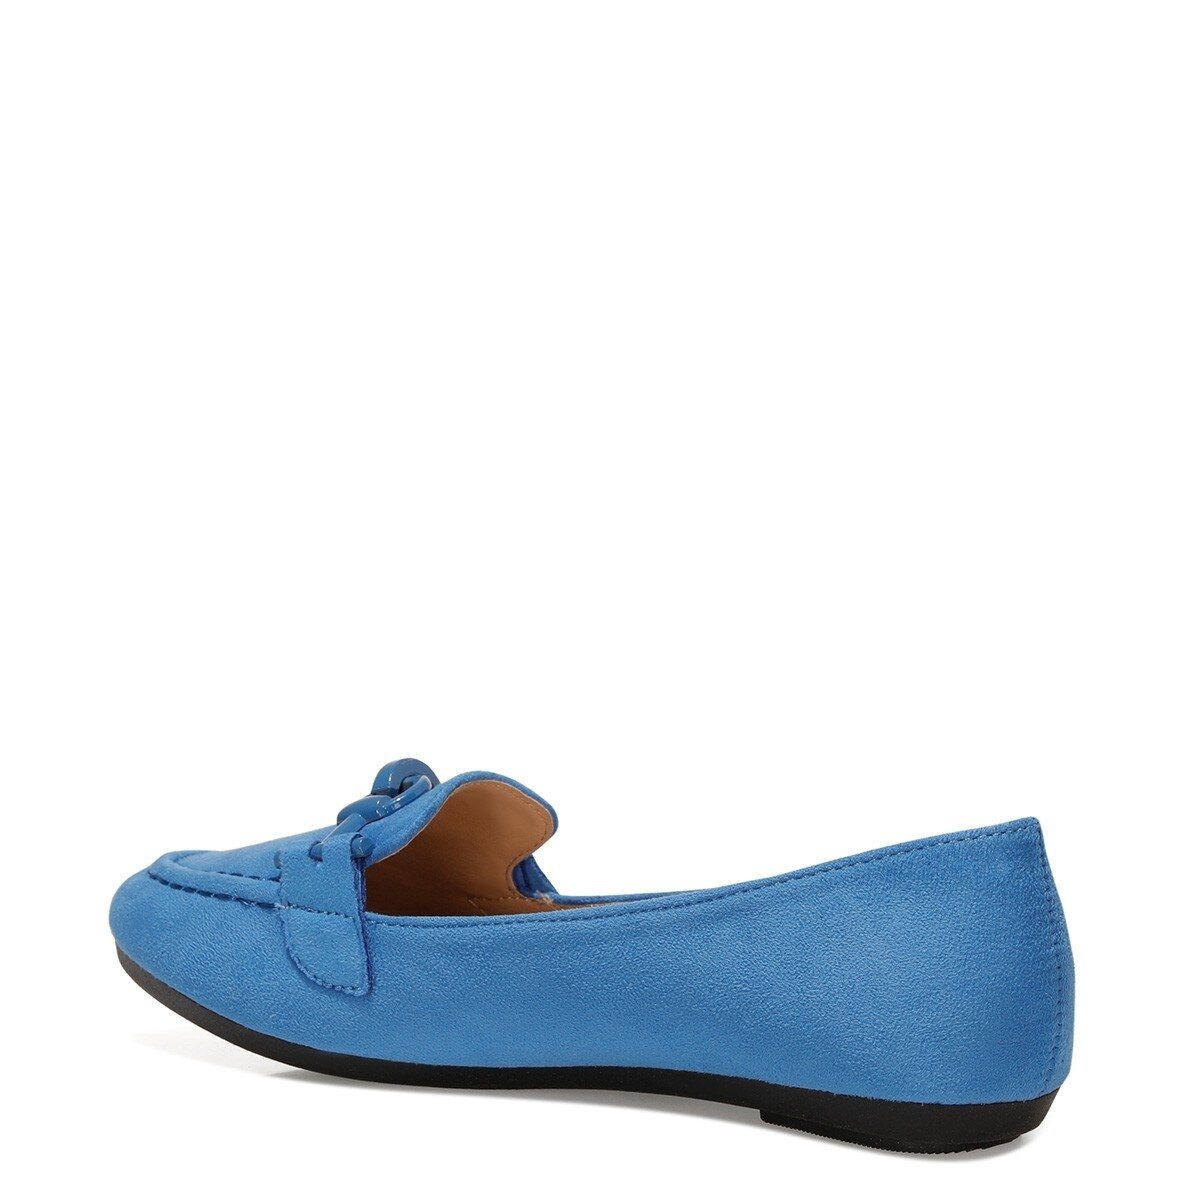 MAED 1FX Mavi Kadın Loafer